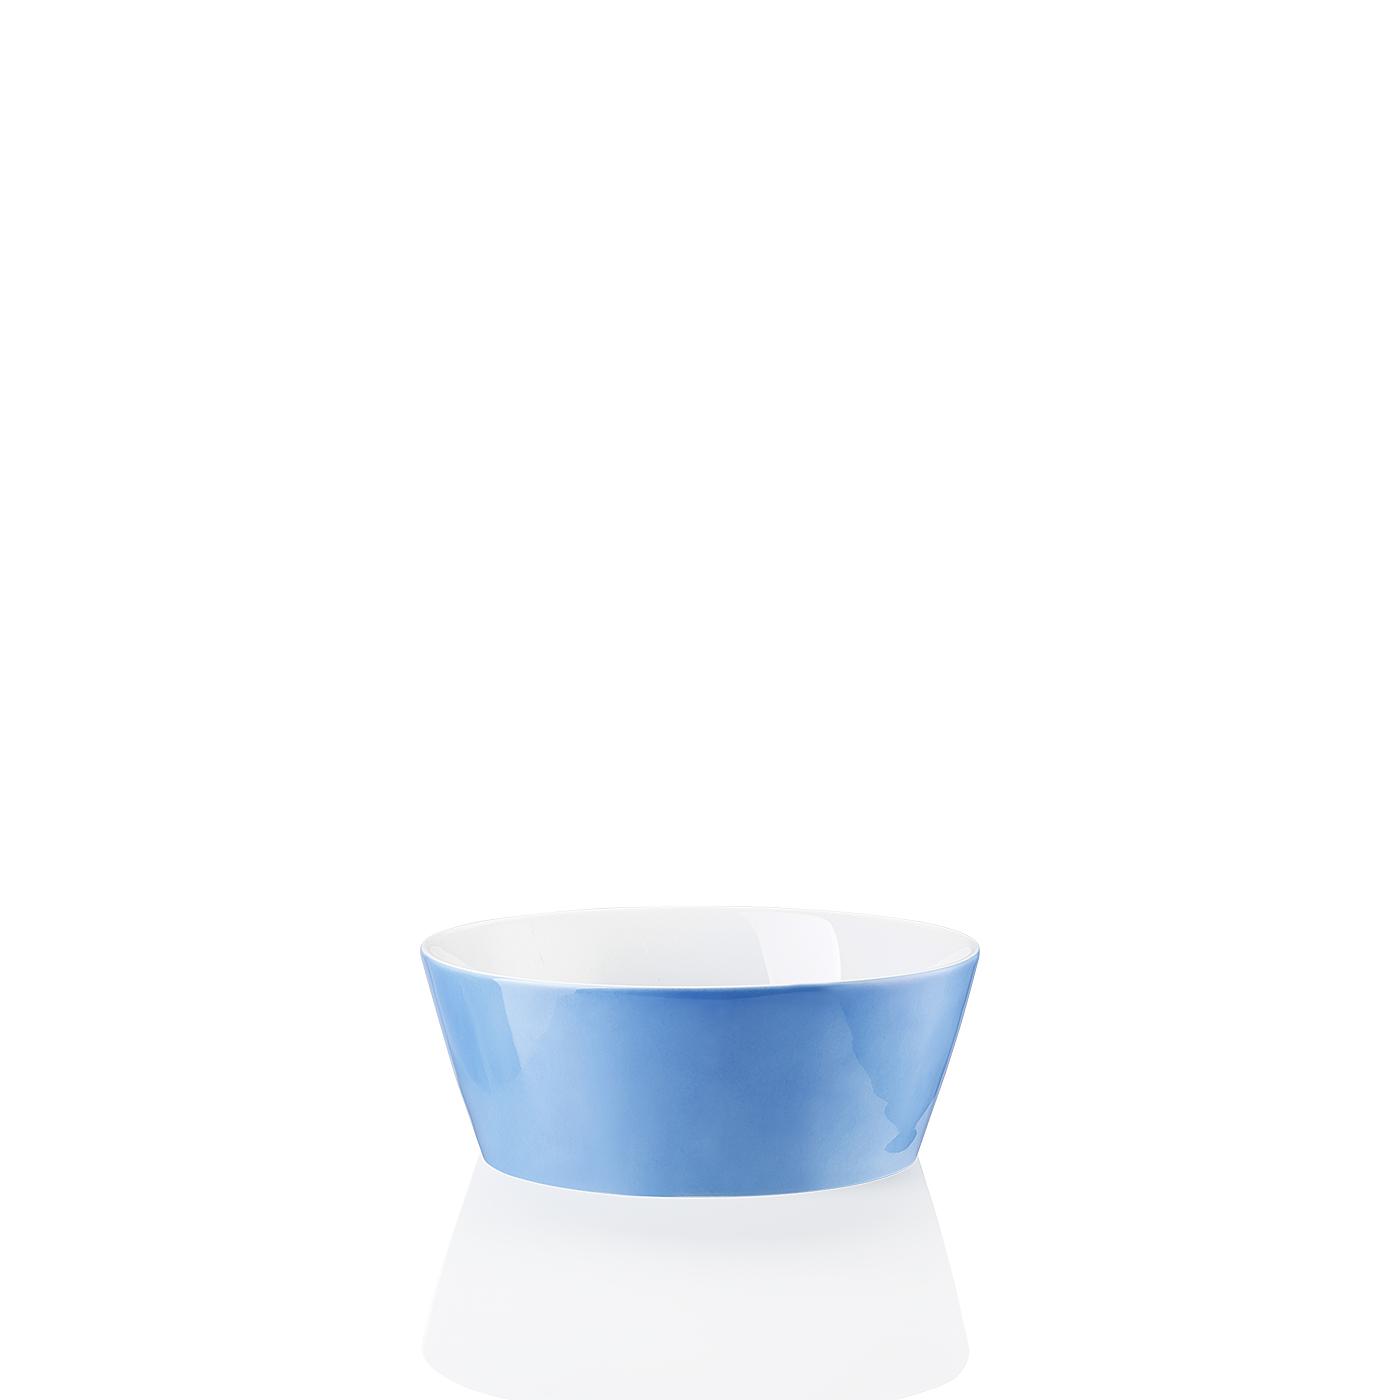 Schale 15 cm Tric Blau Arzberg